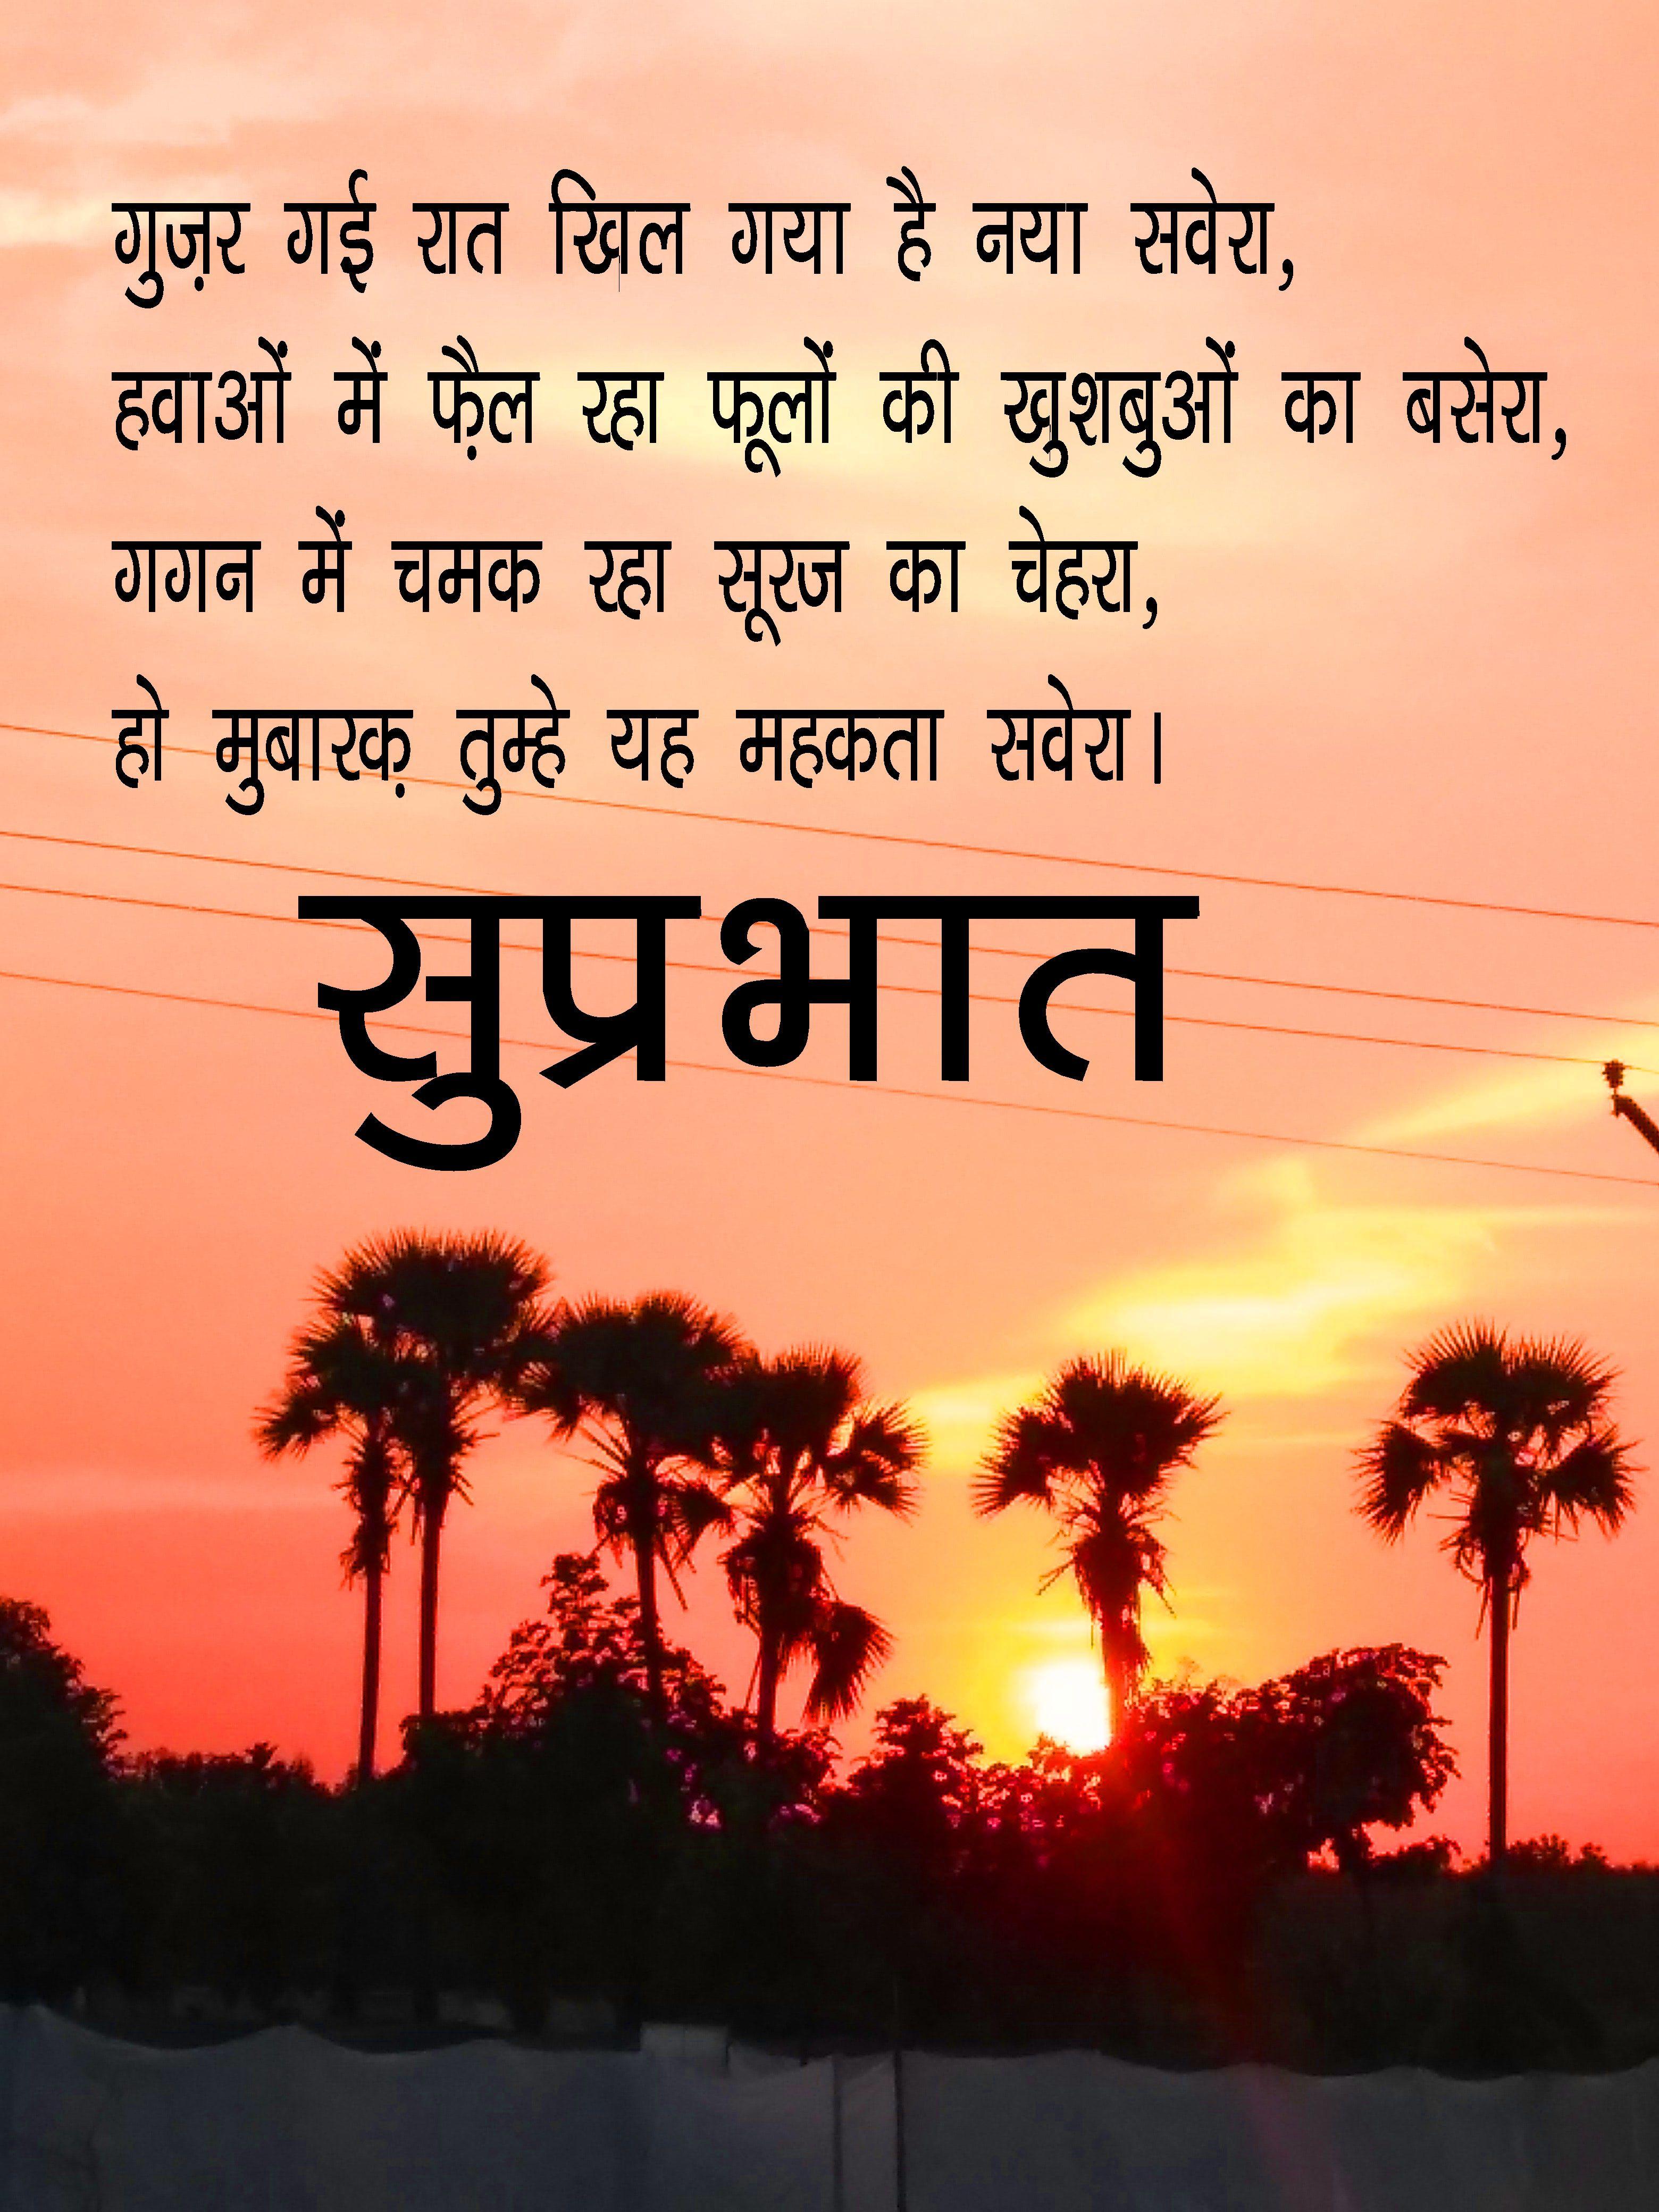 wake up quotes in hindi